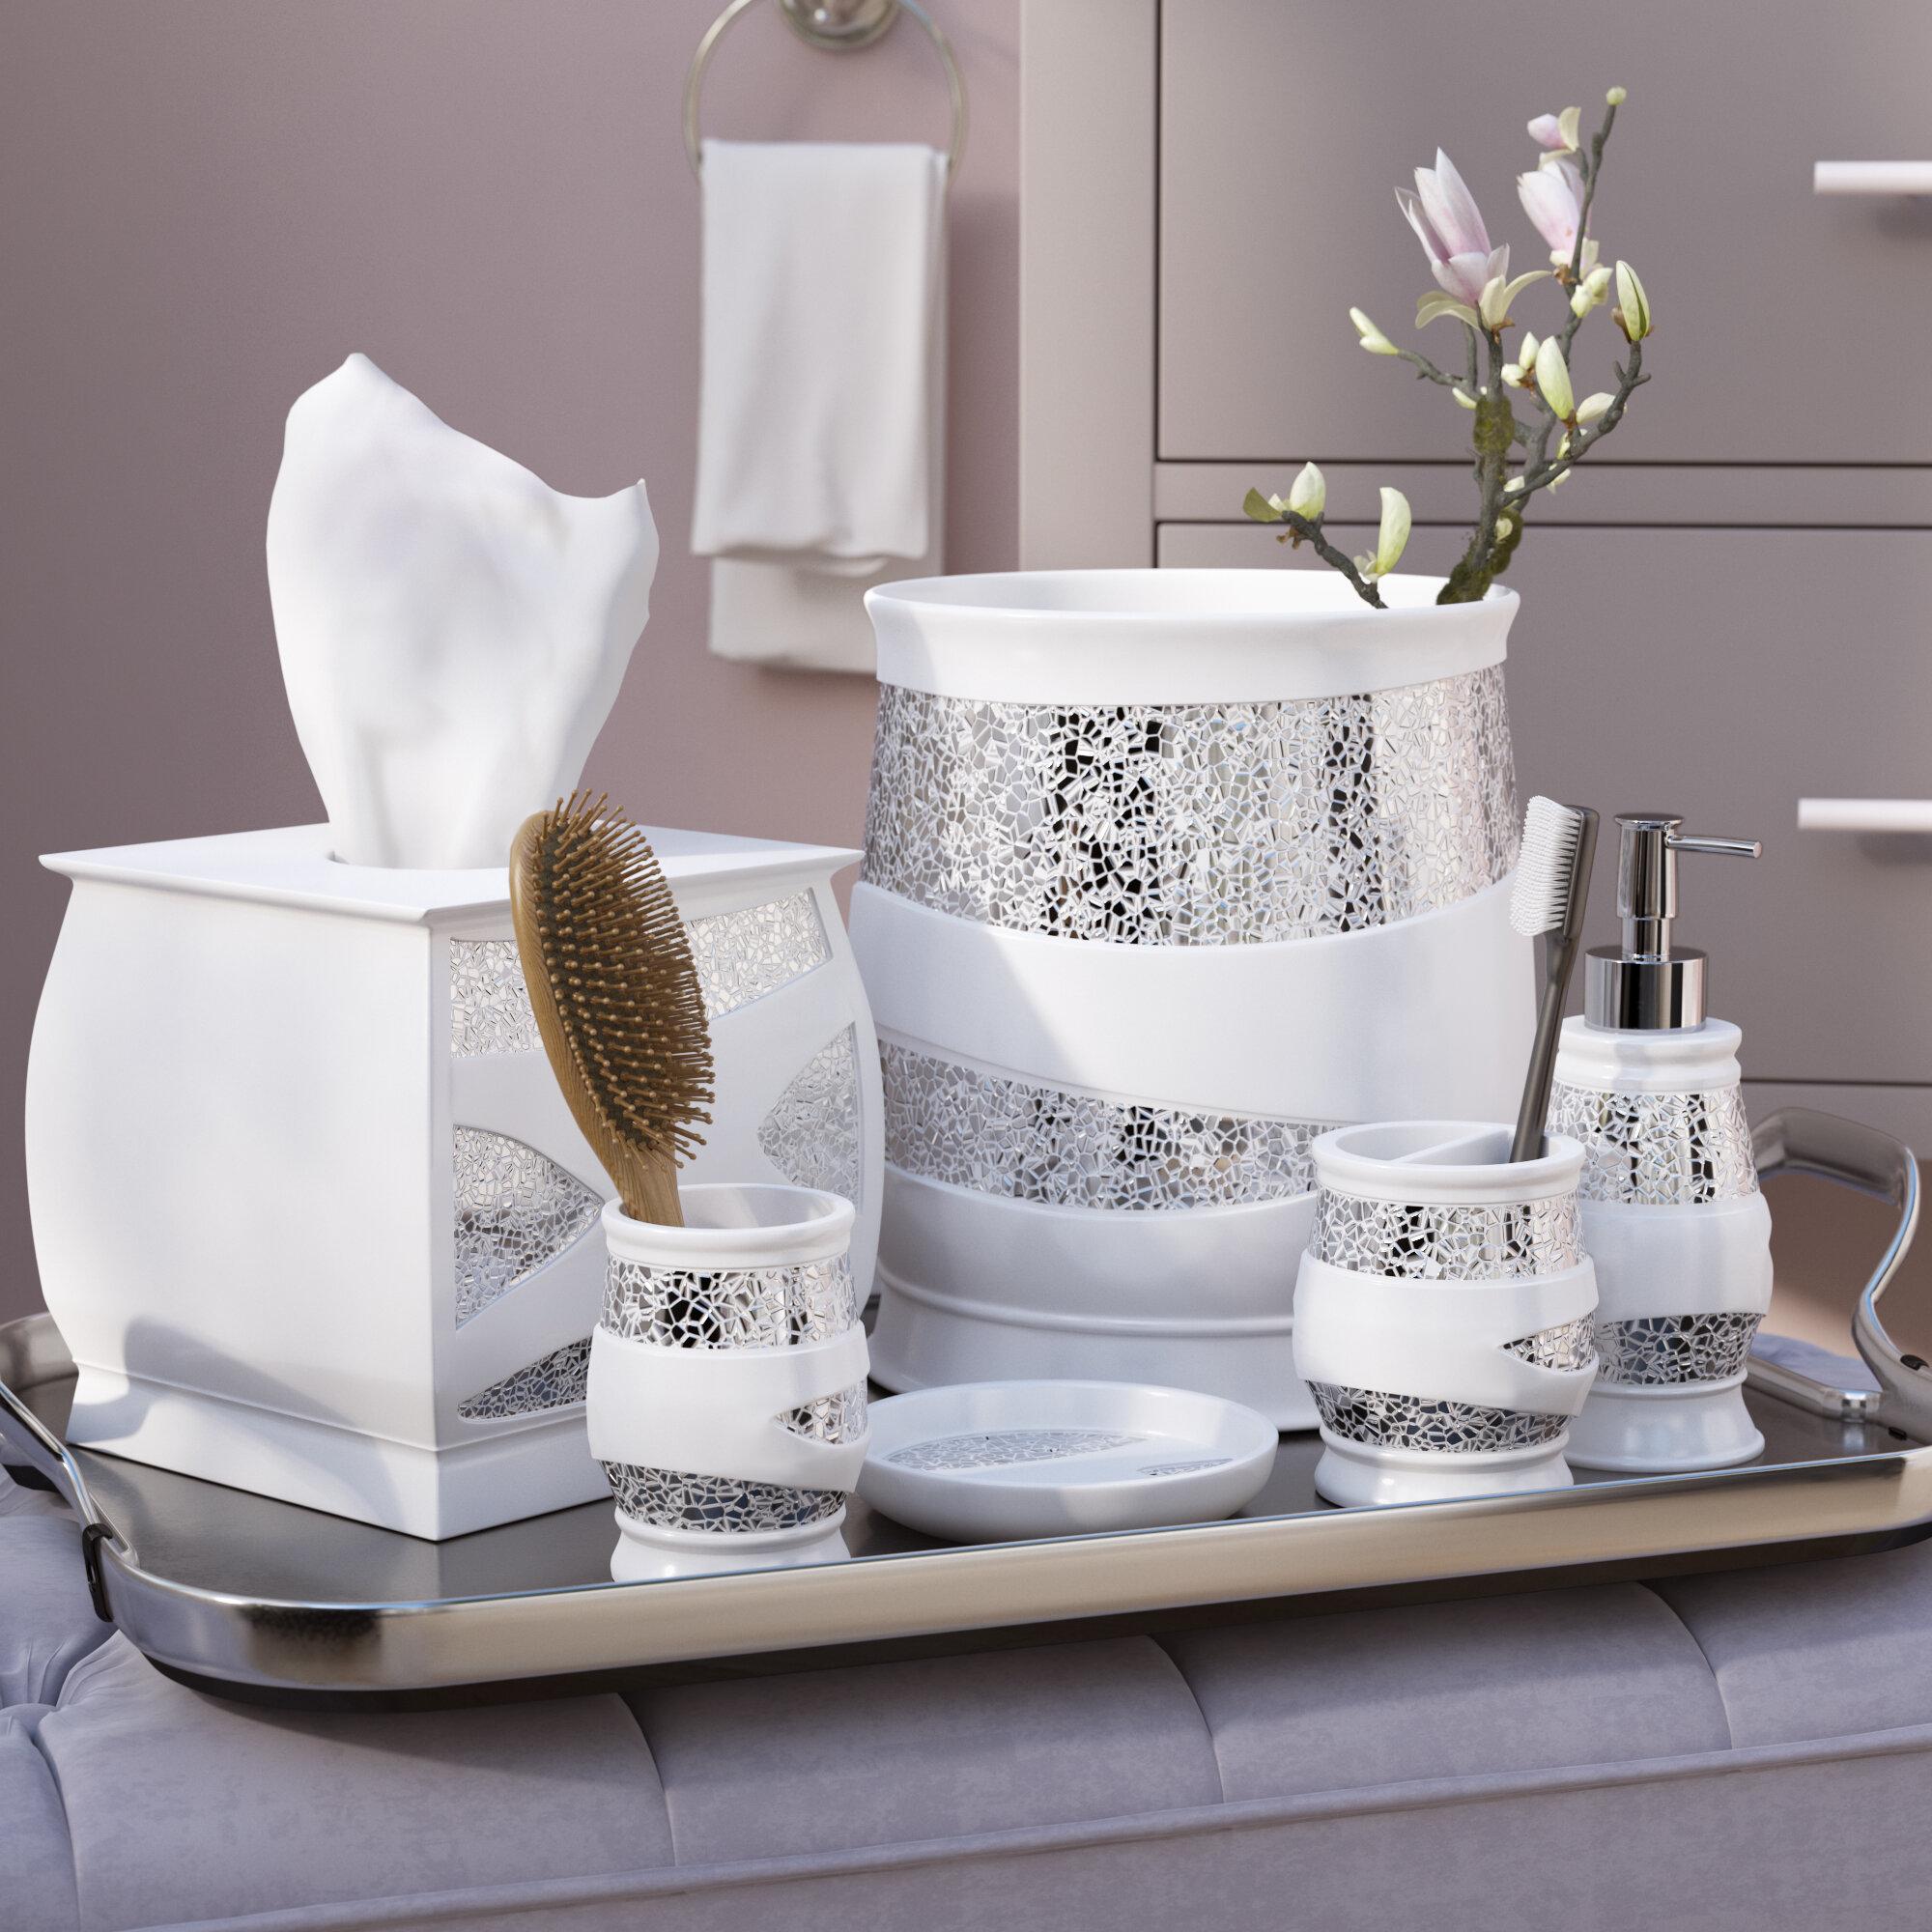 Willa Arlo Interiors Rivet 6 Piece White/Silver Bathroom Accessory Set U0026  Reviews | Wayfair